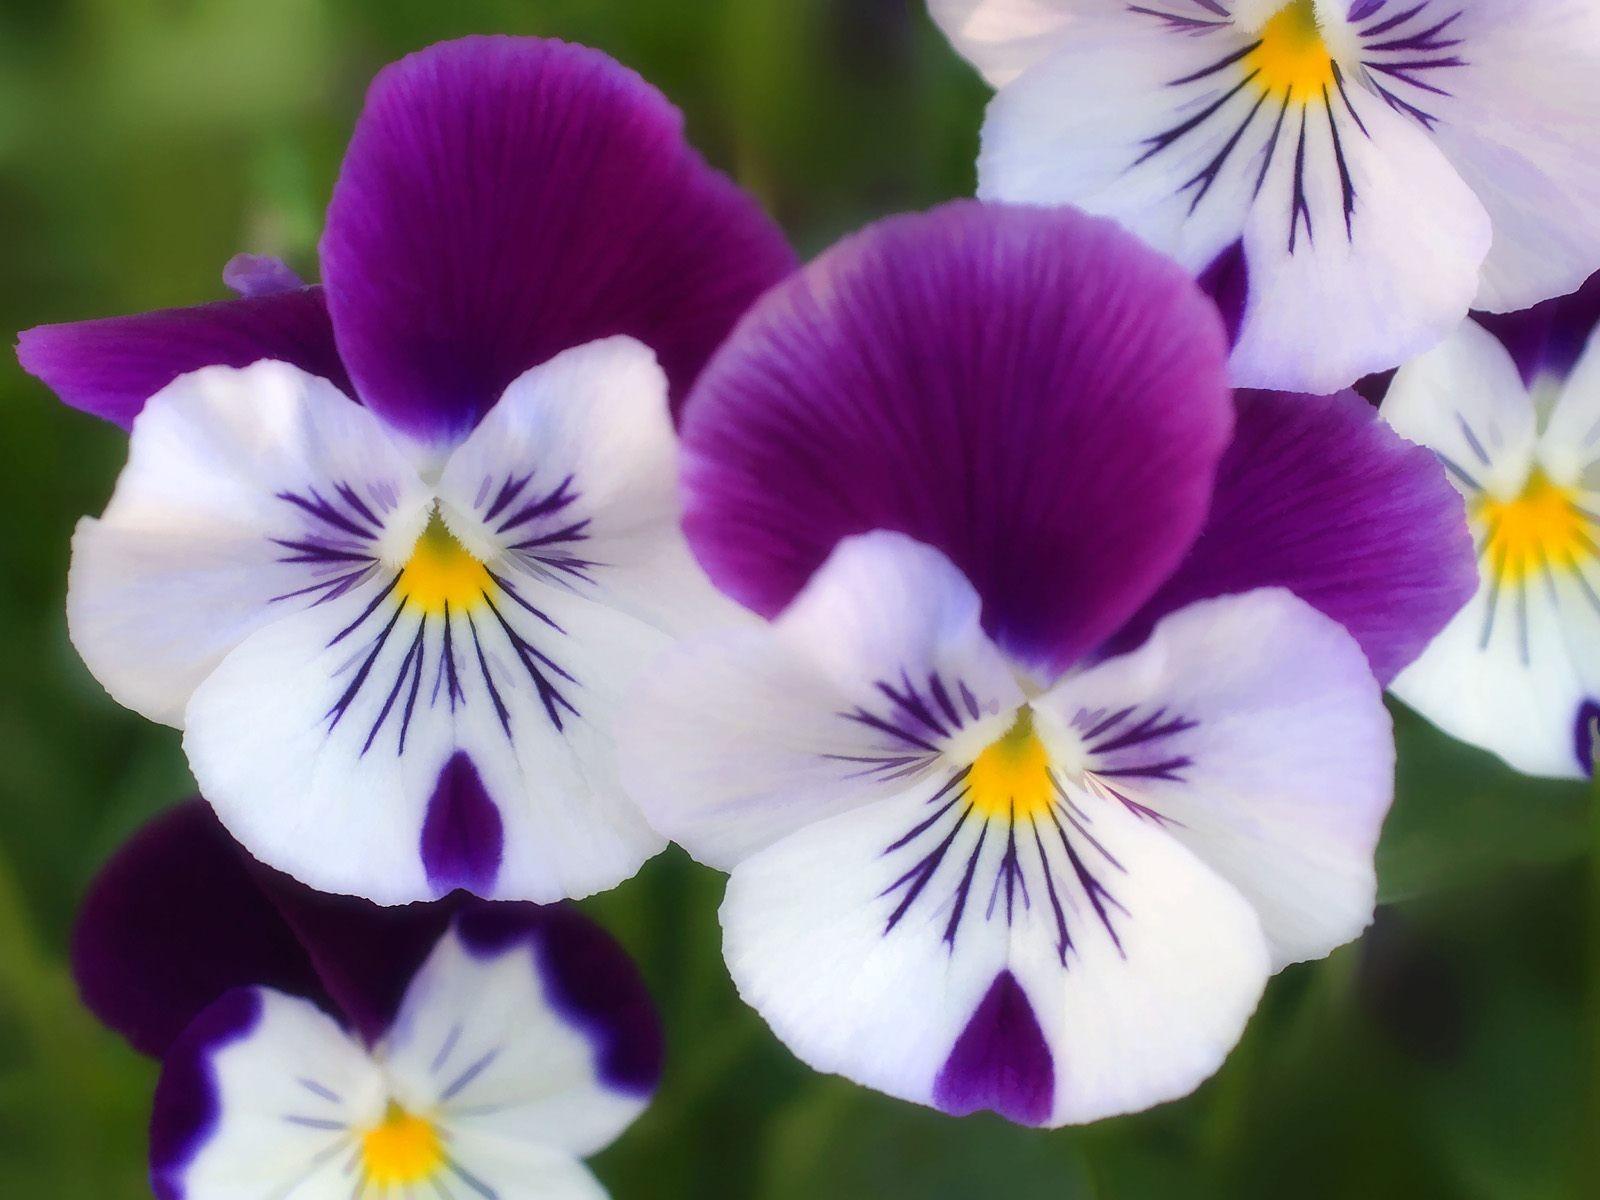 Romantic Flowers: Flowers